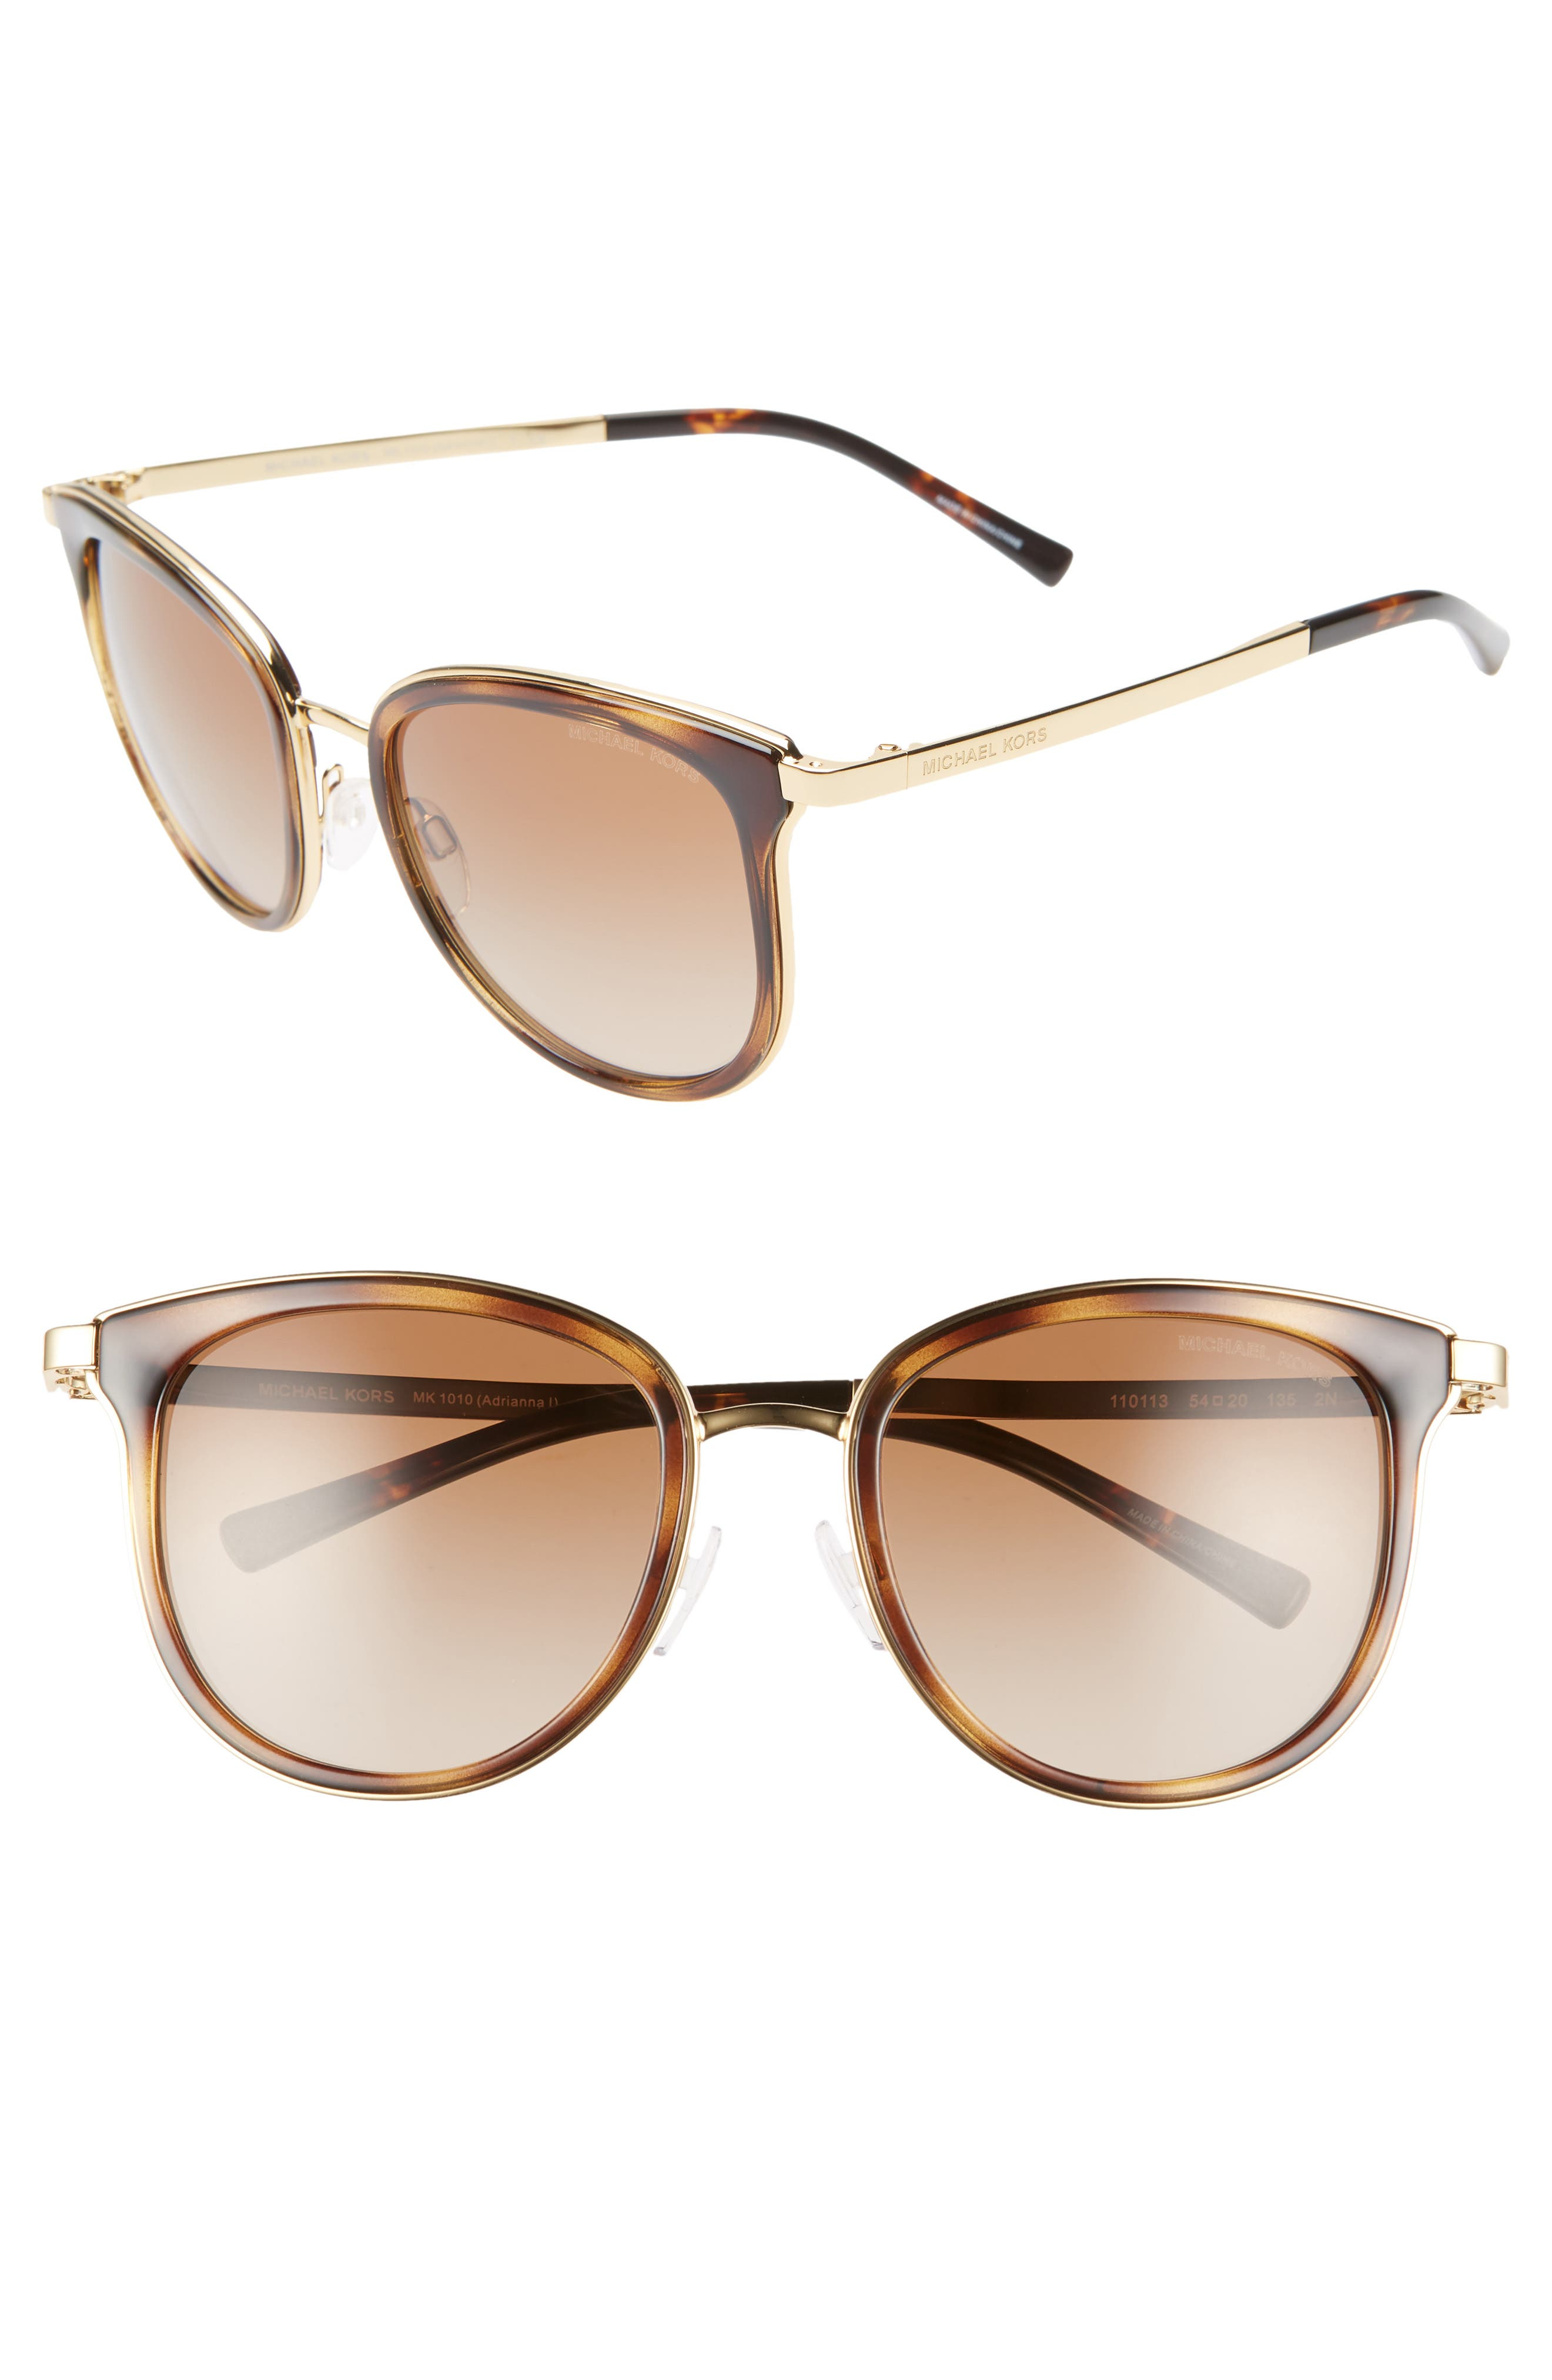 54mm Round Sunglasses,                             Main thumbnail 1, color,                             200